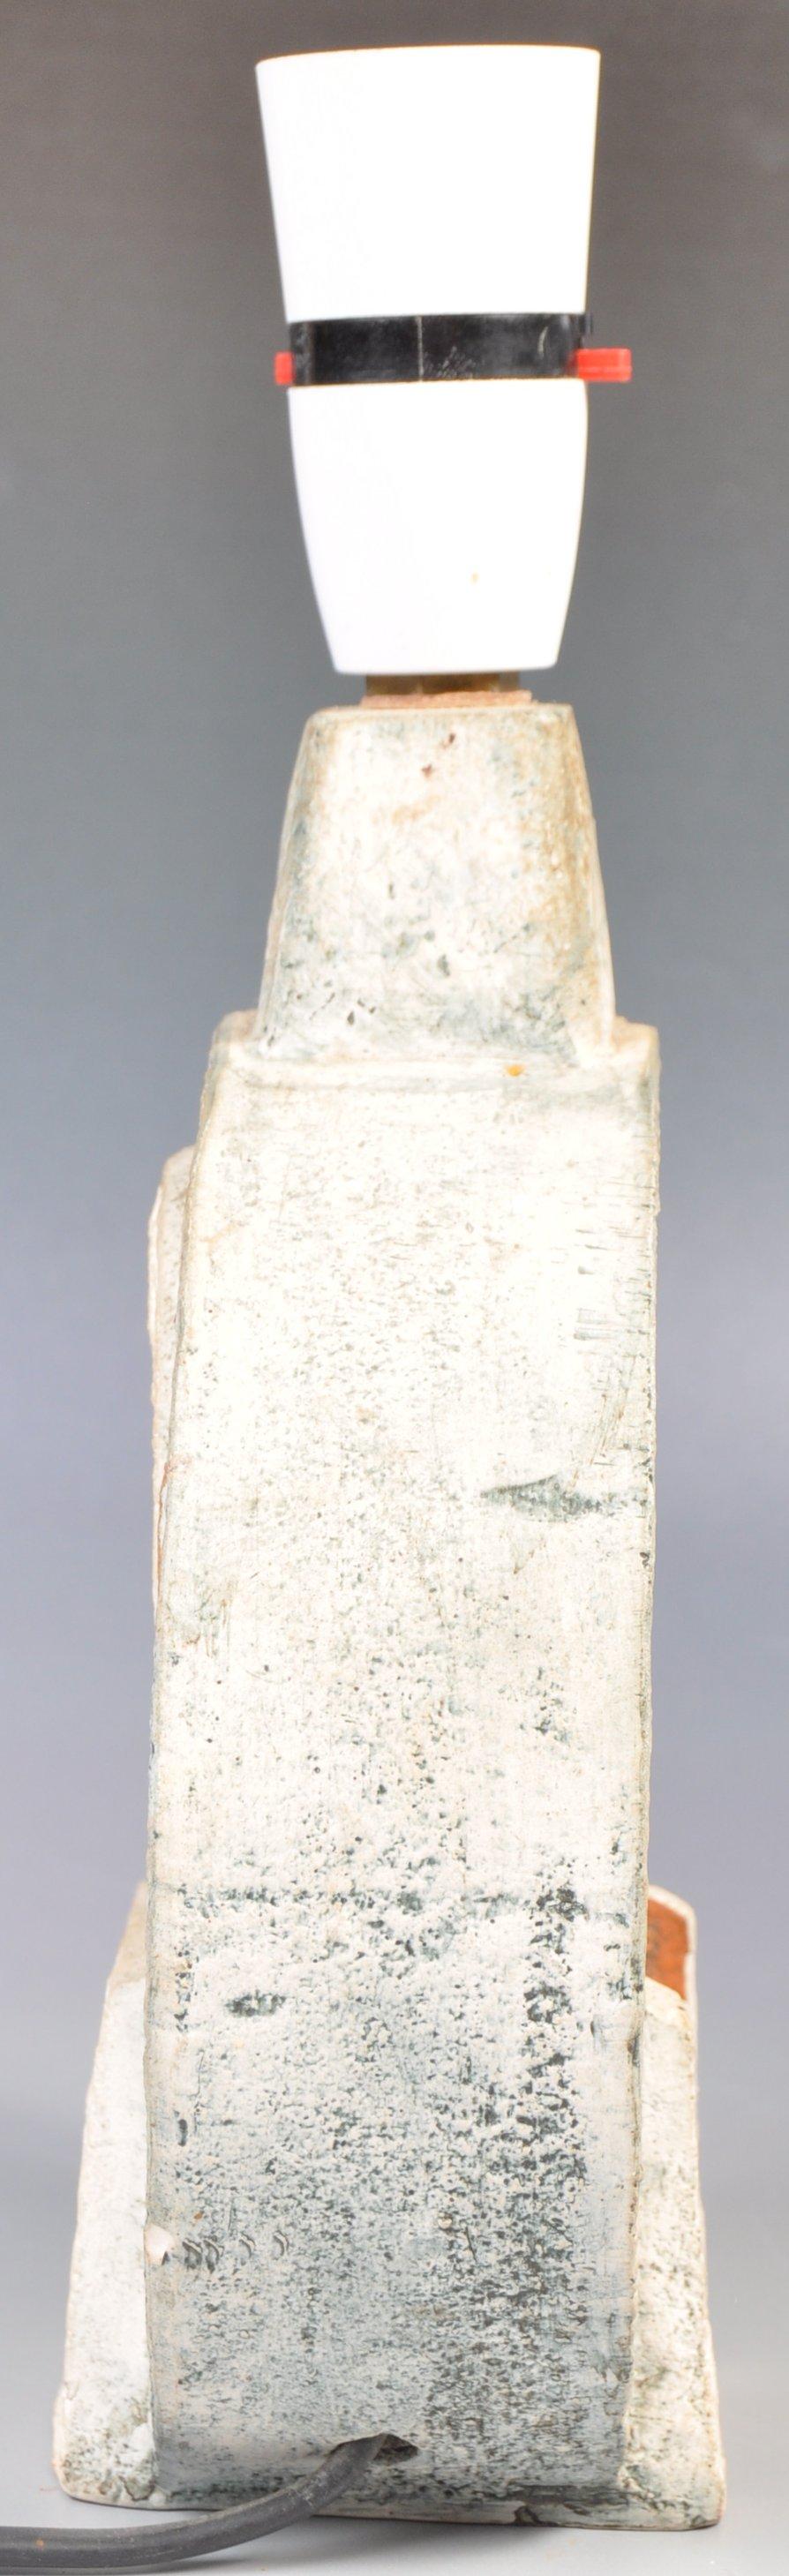 SIMONE KILBURN WHEEL VASE LAMP BY TROIKA - Image 5 of 6